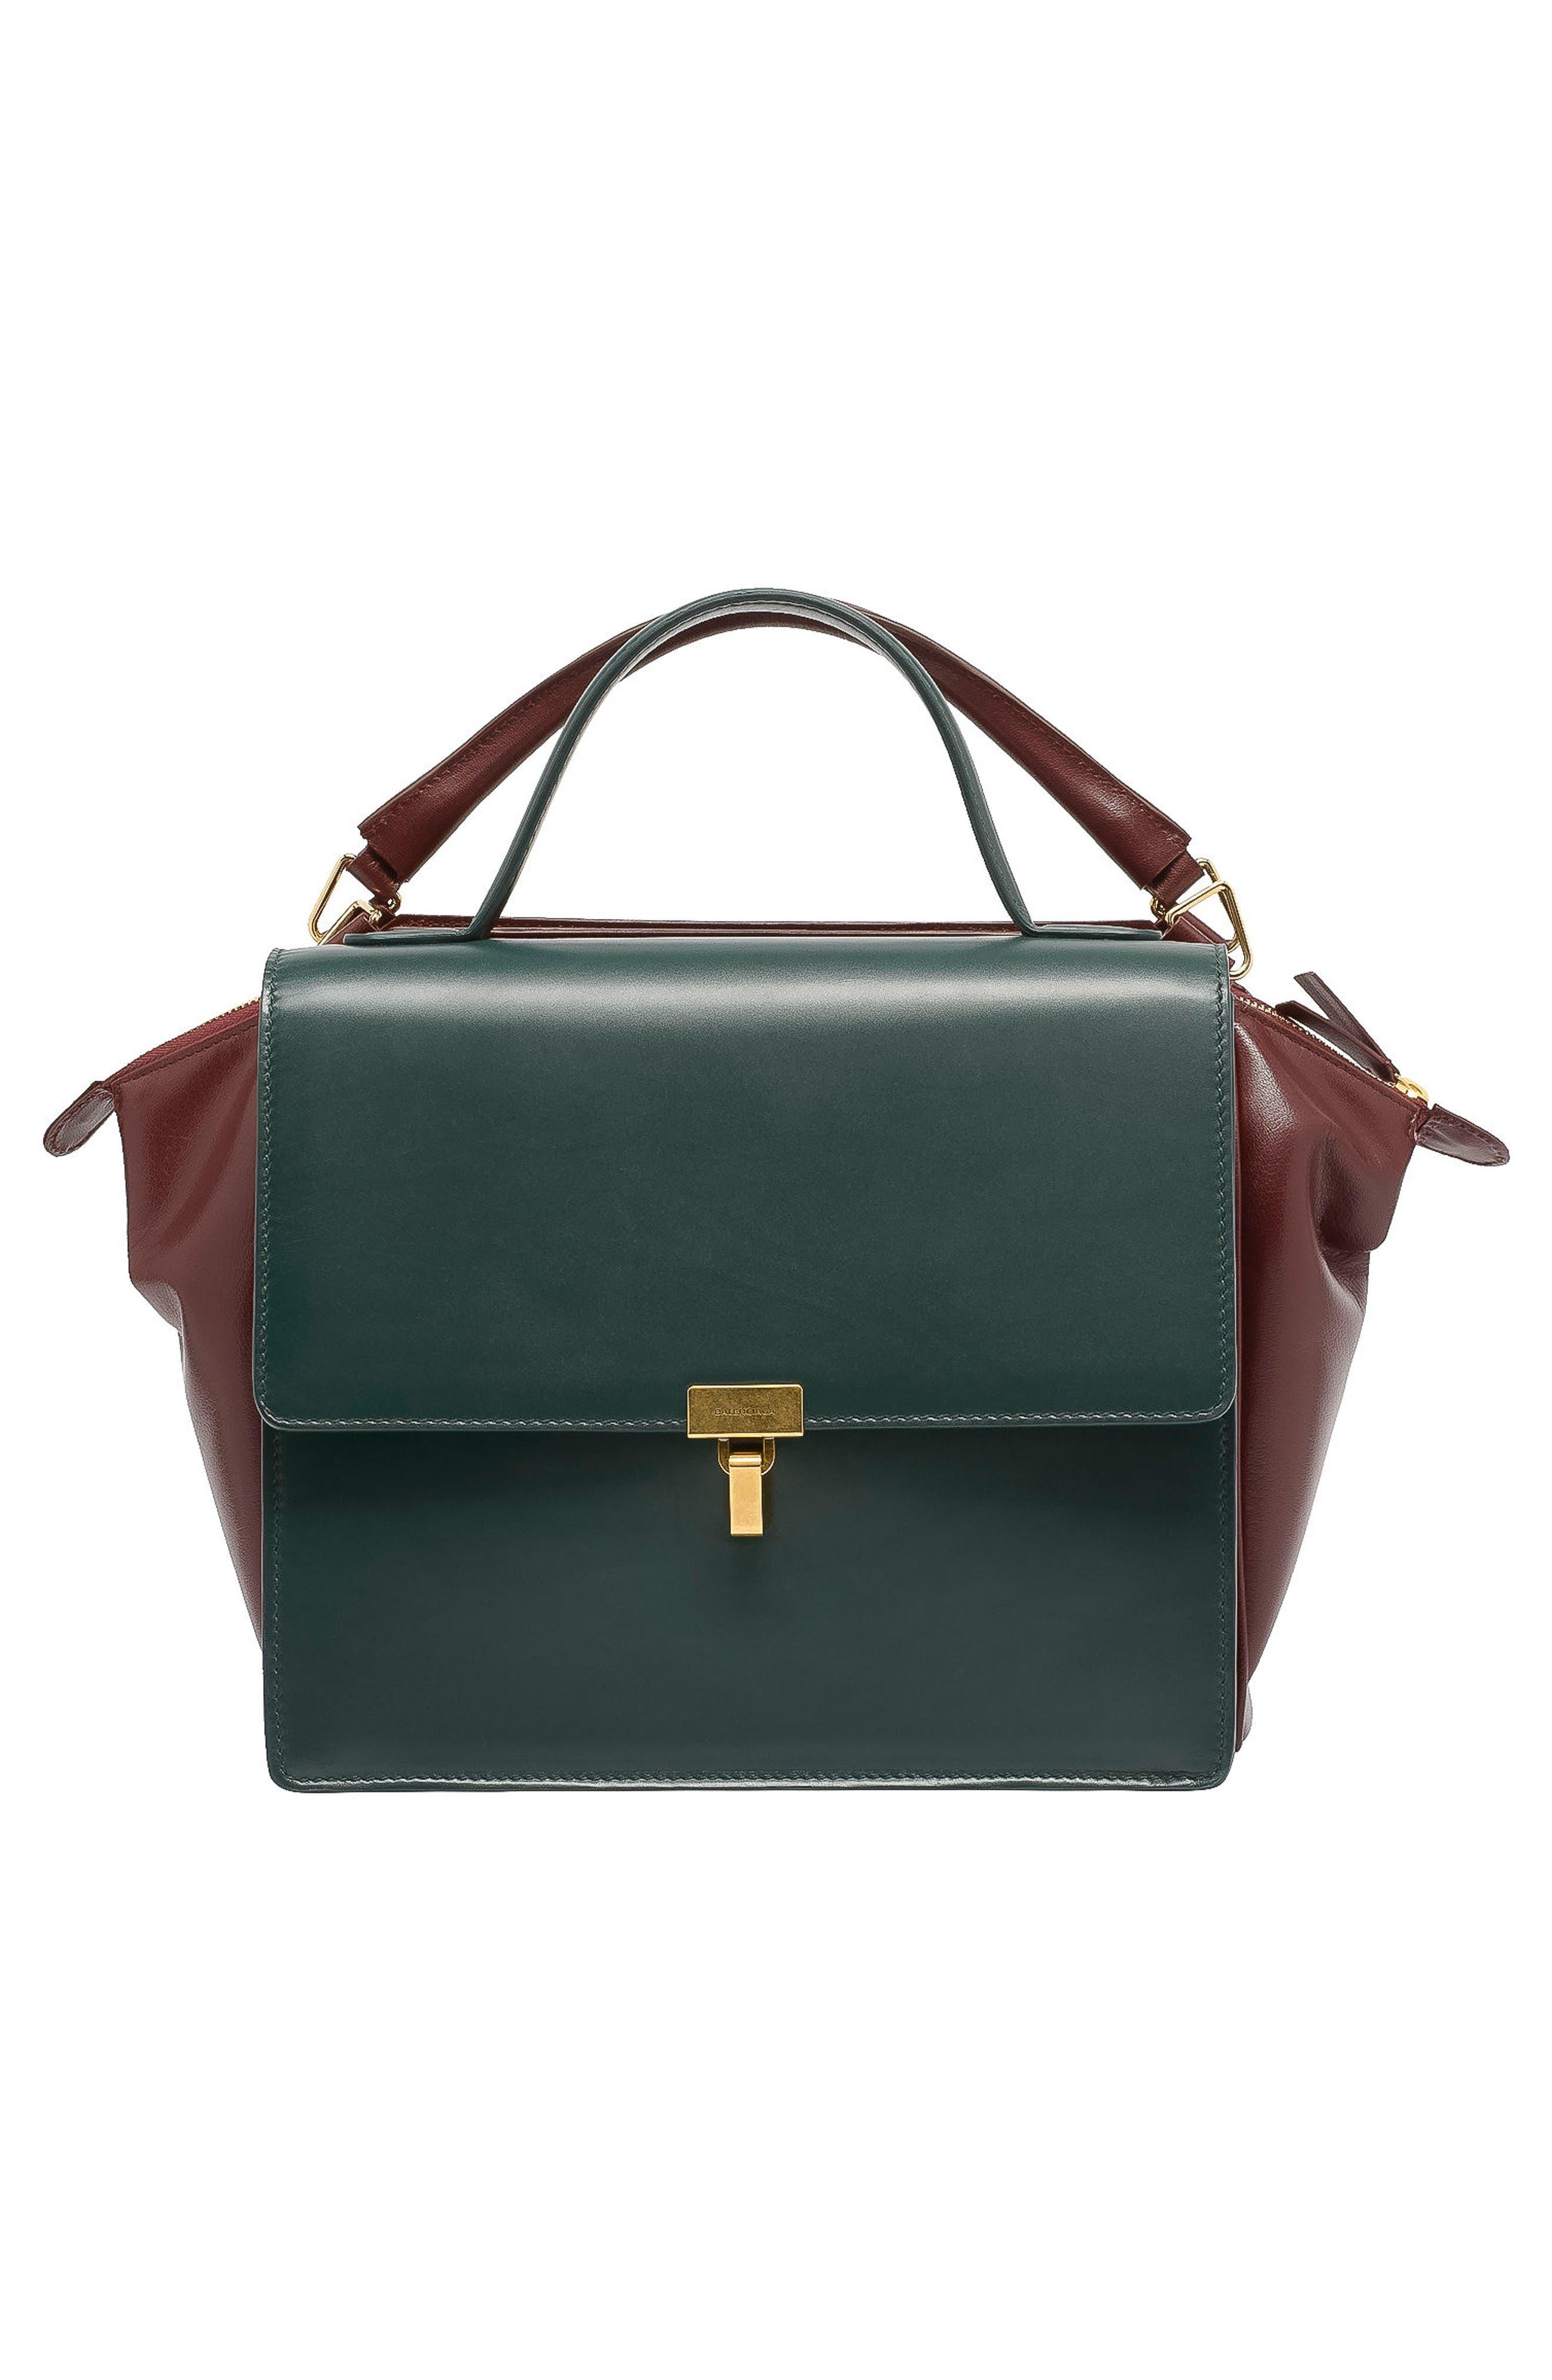 Main Image - Balenciaga Collage Double Calfskin Leather Bag